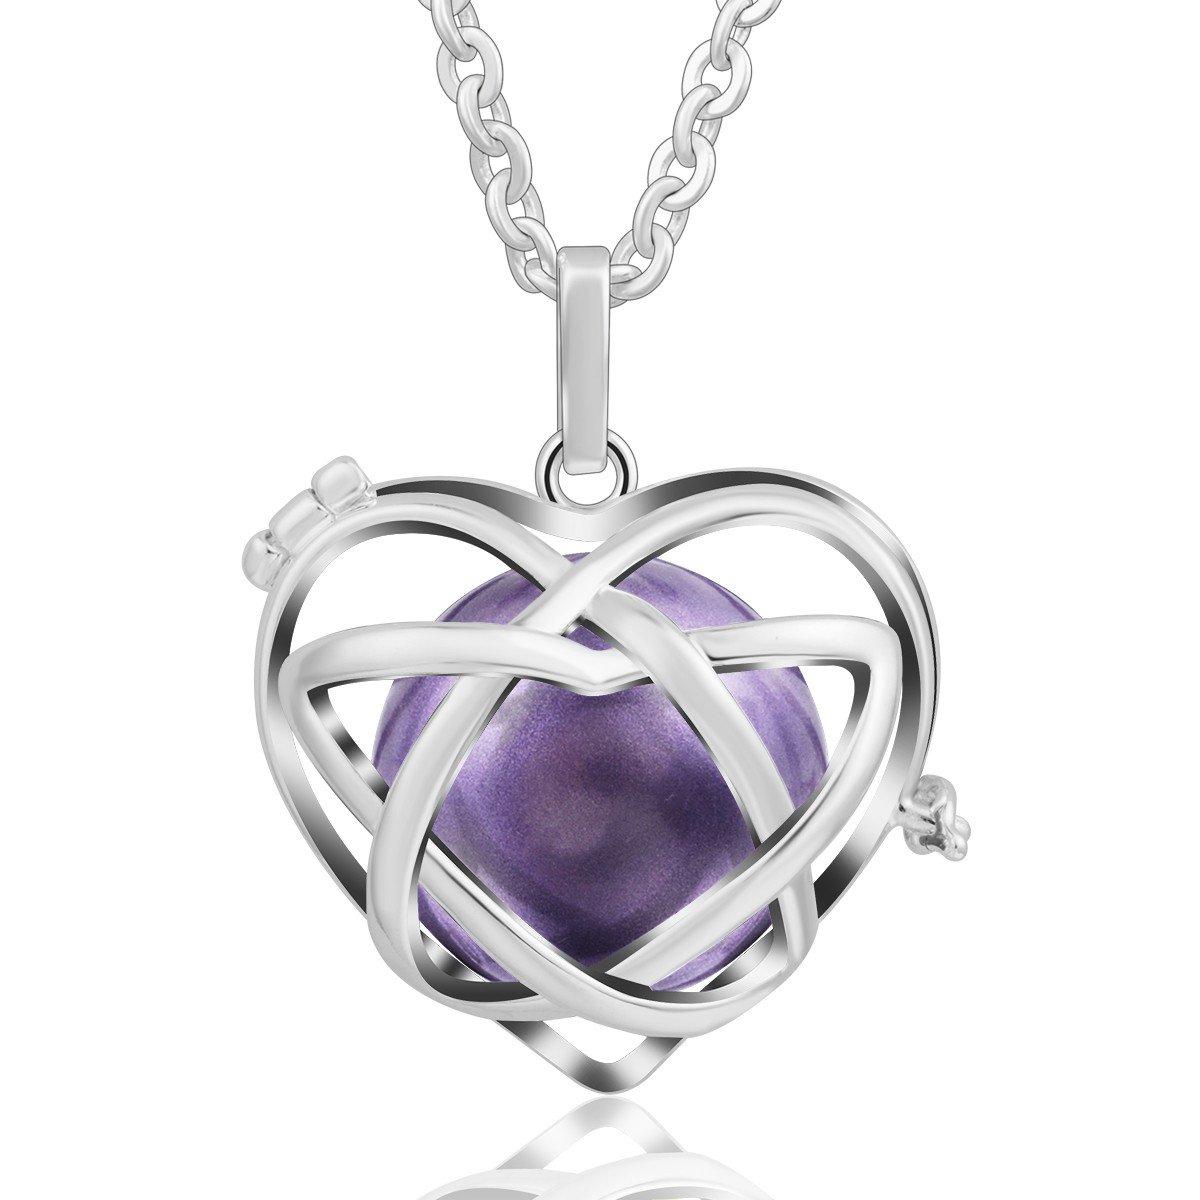 EUDORA Harmony Ball Necklace Unicursal Hexagram Music Chime Gift to Mom Baby Shower Gift, 30'' Chain Lavender